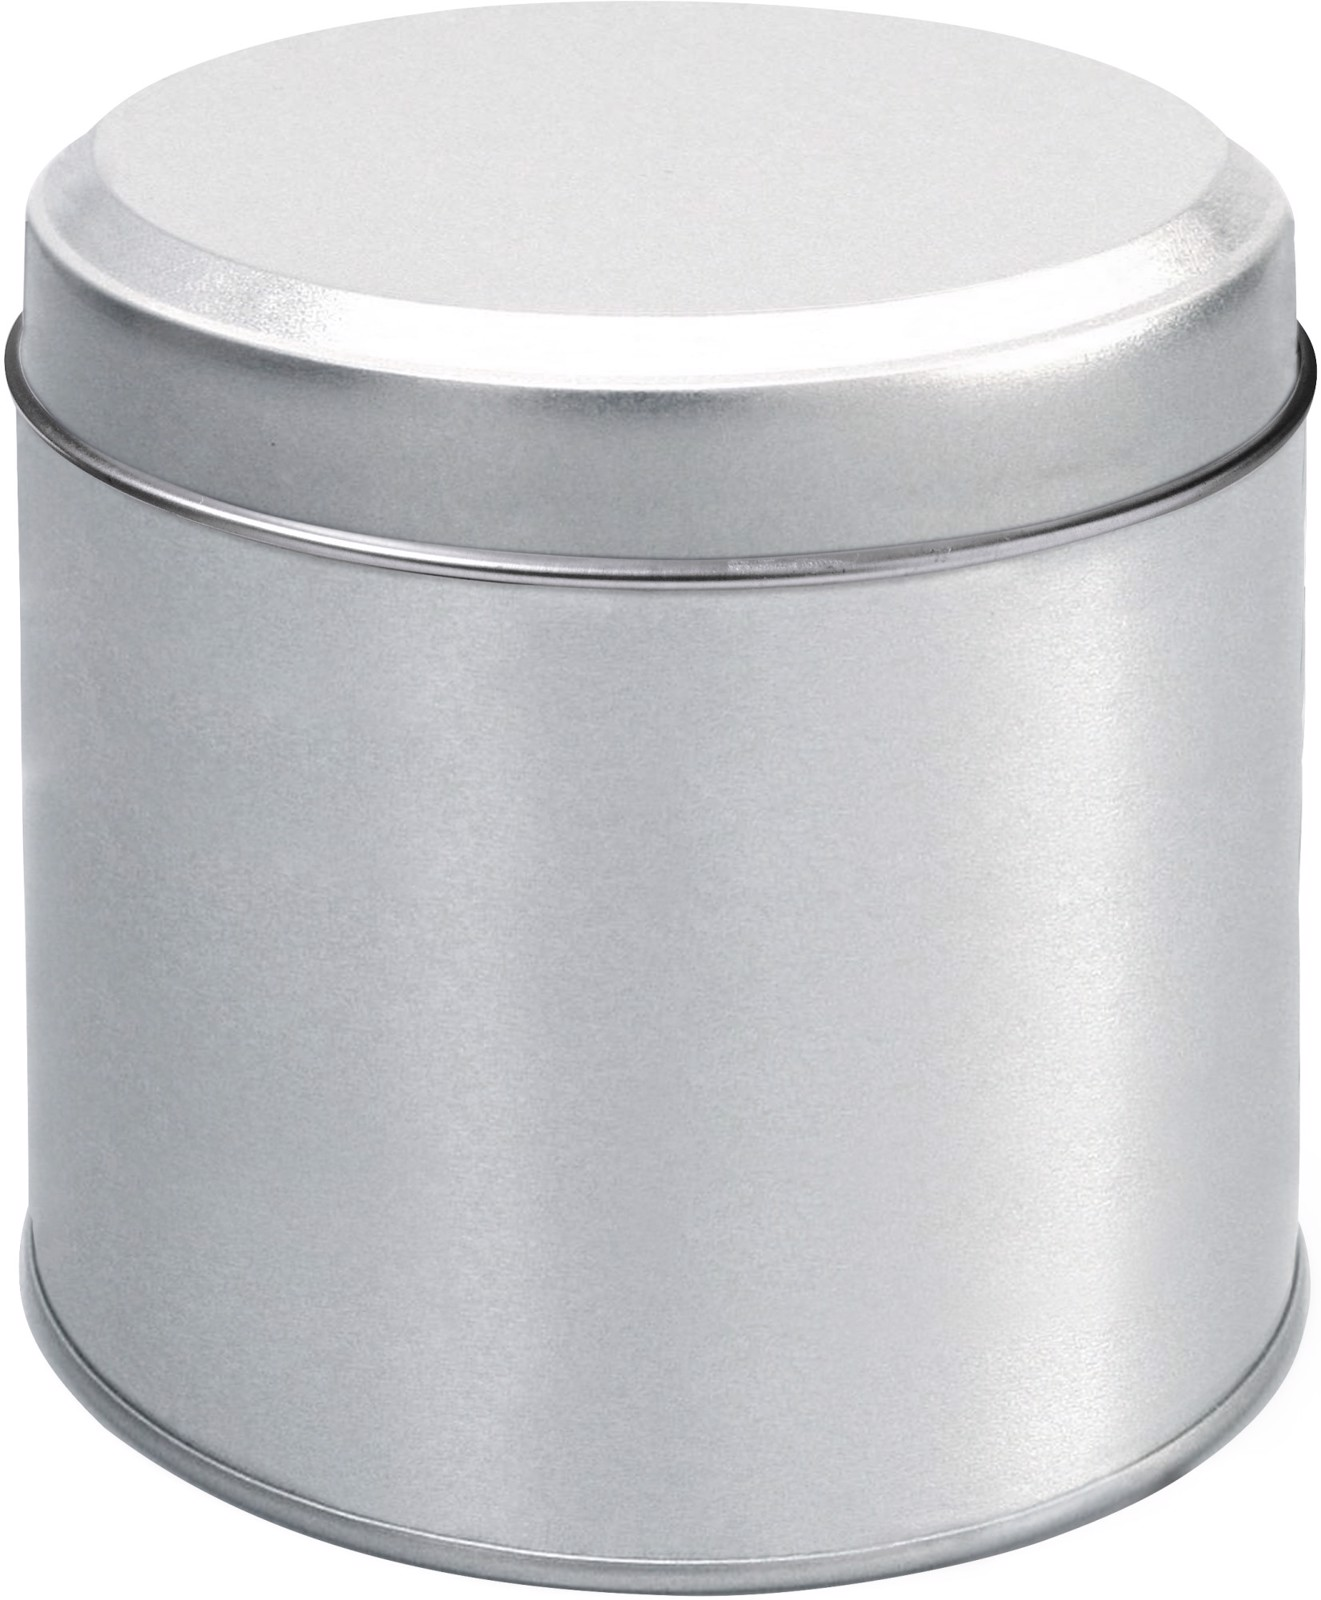 Tin for Dutch waffles - Silver